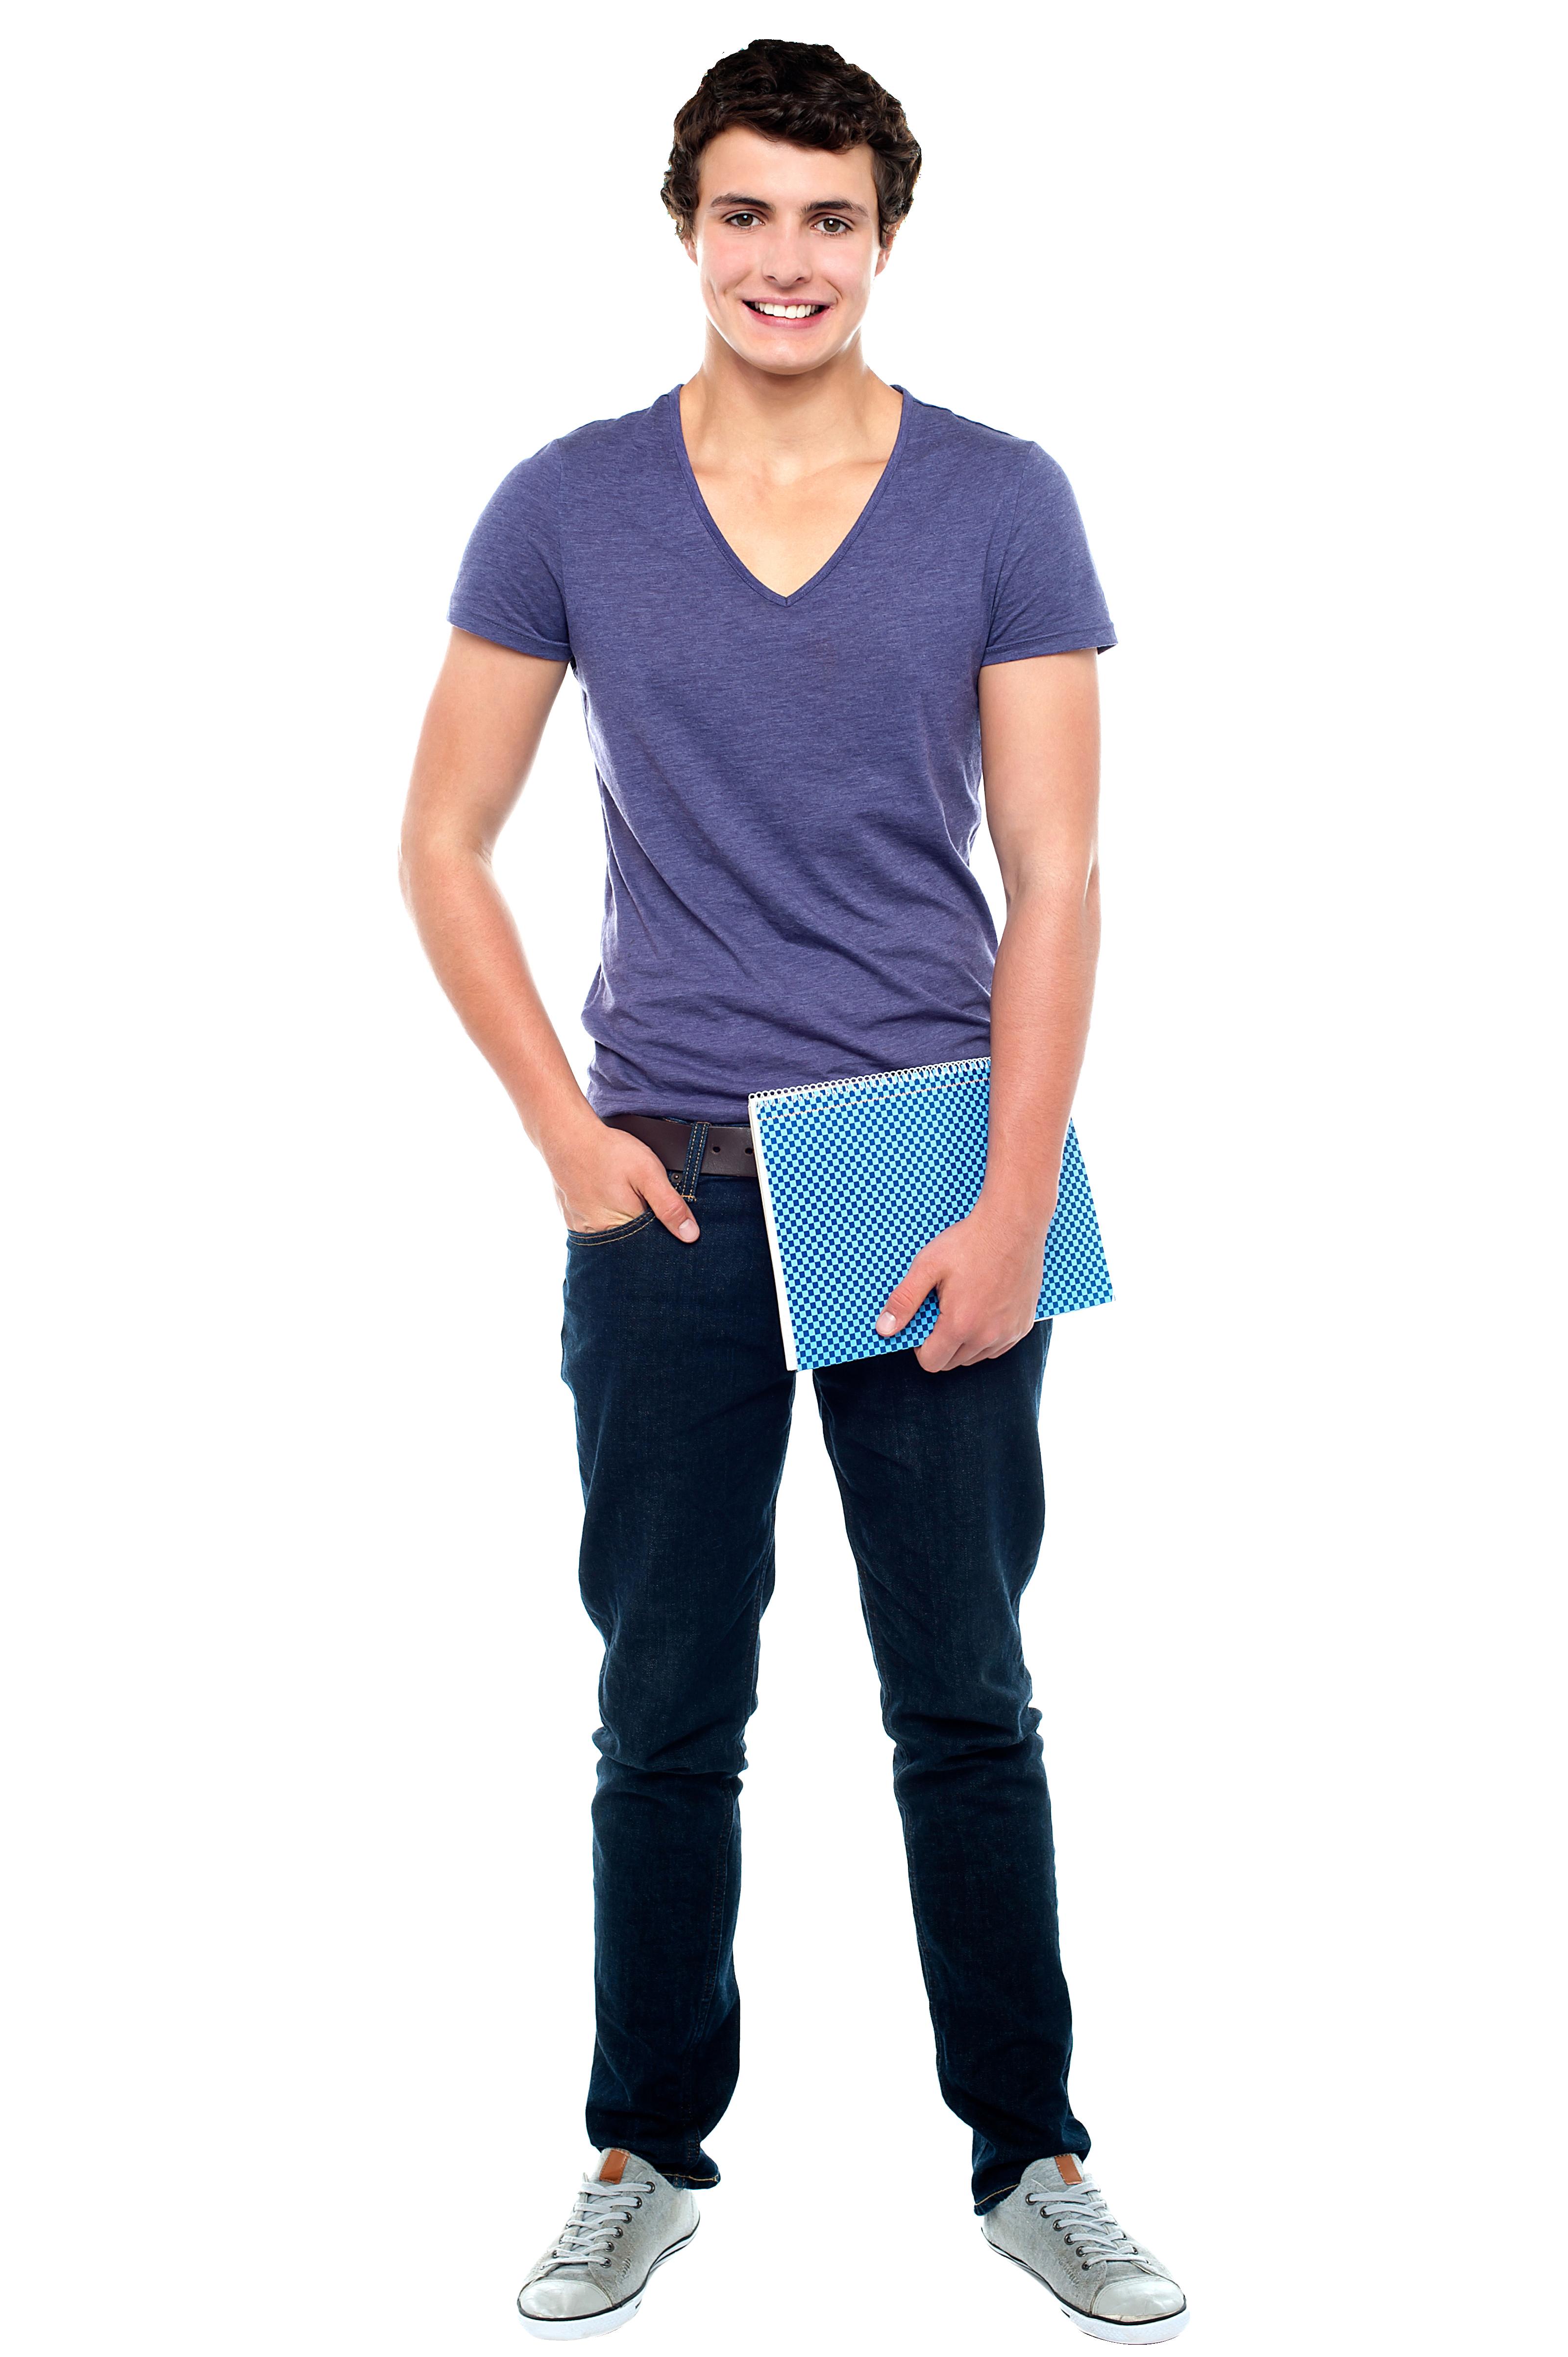 Happy Color Student Png Image Purepng Free Transparent Cc0 Png